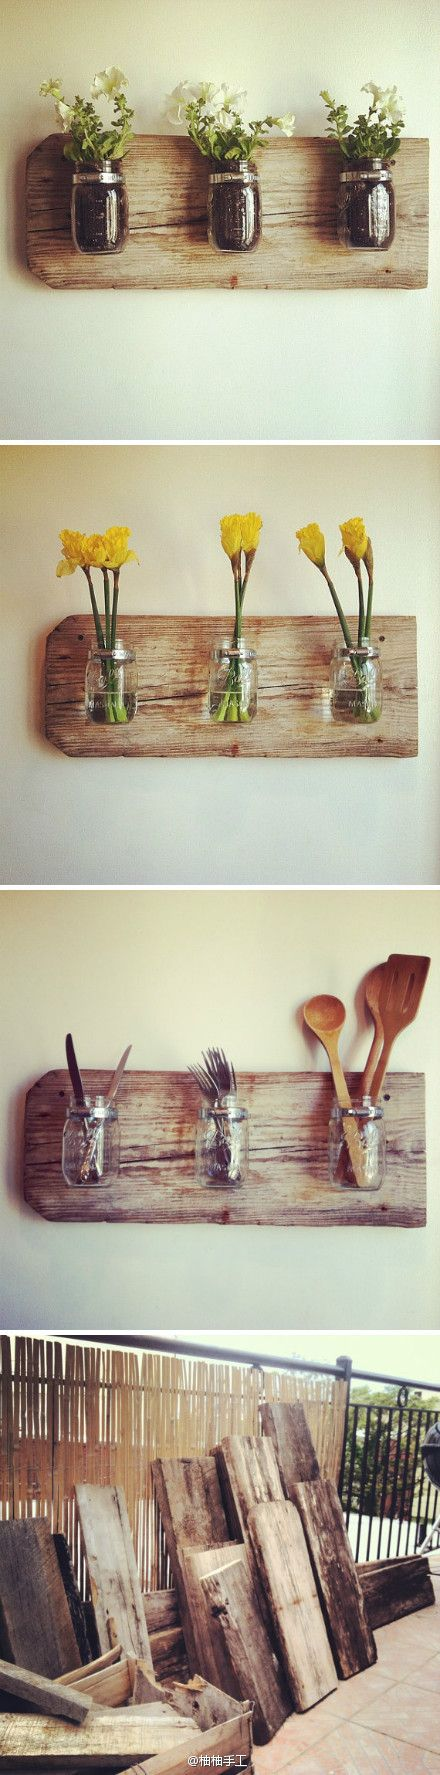 Creative storage and decor